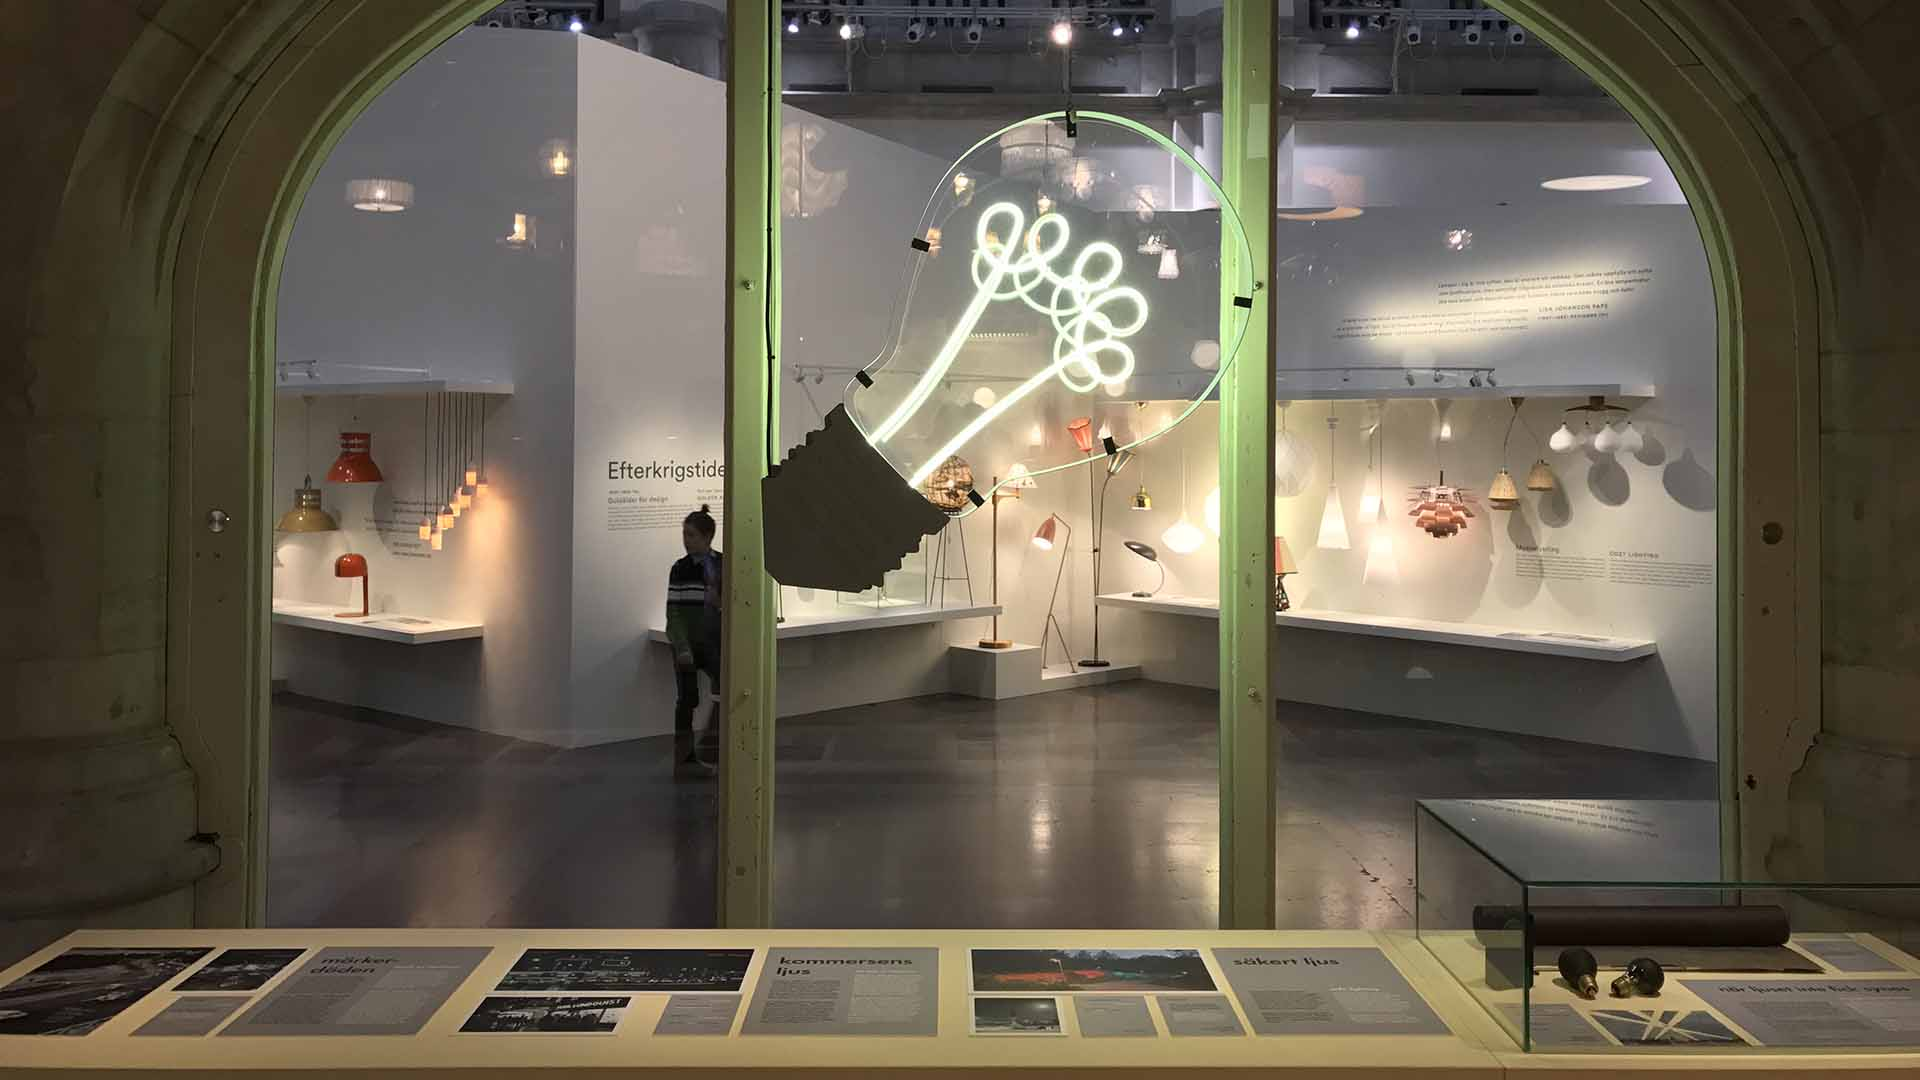 Neon Lamp Installation Nordic Light Exhibition Nordiska Museet